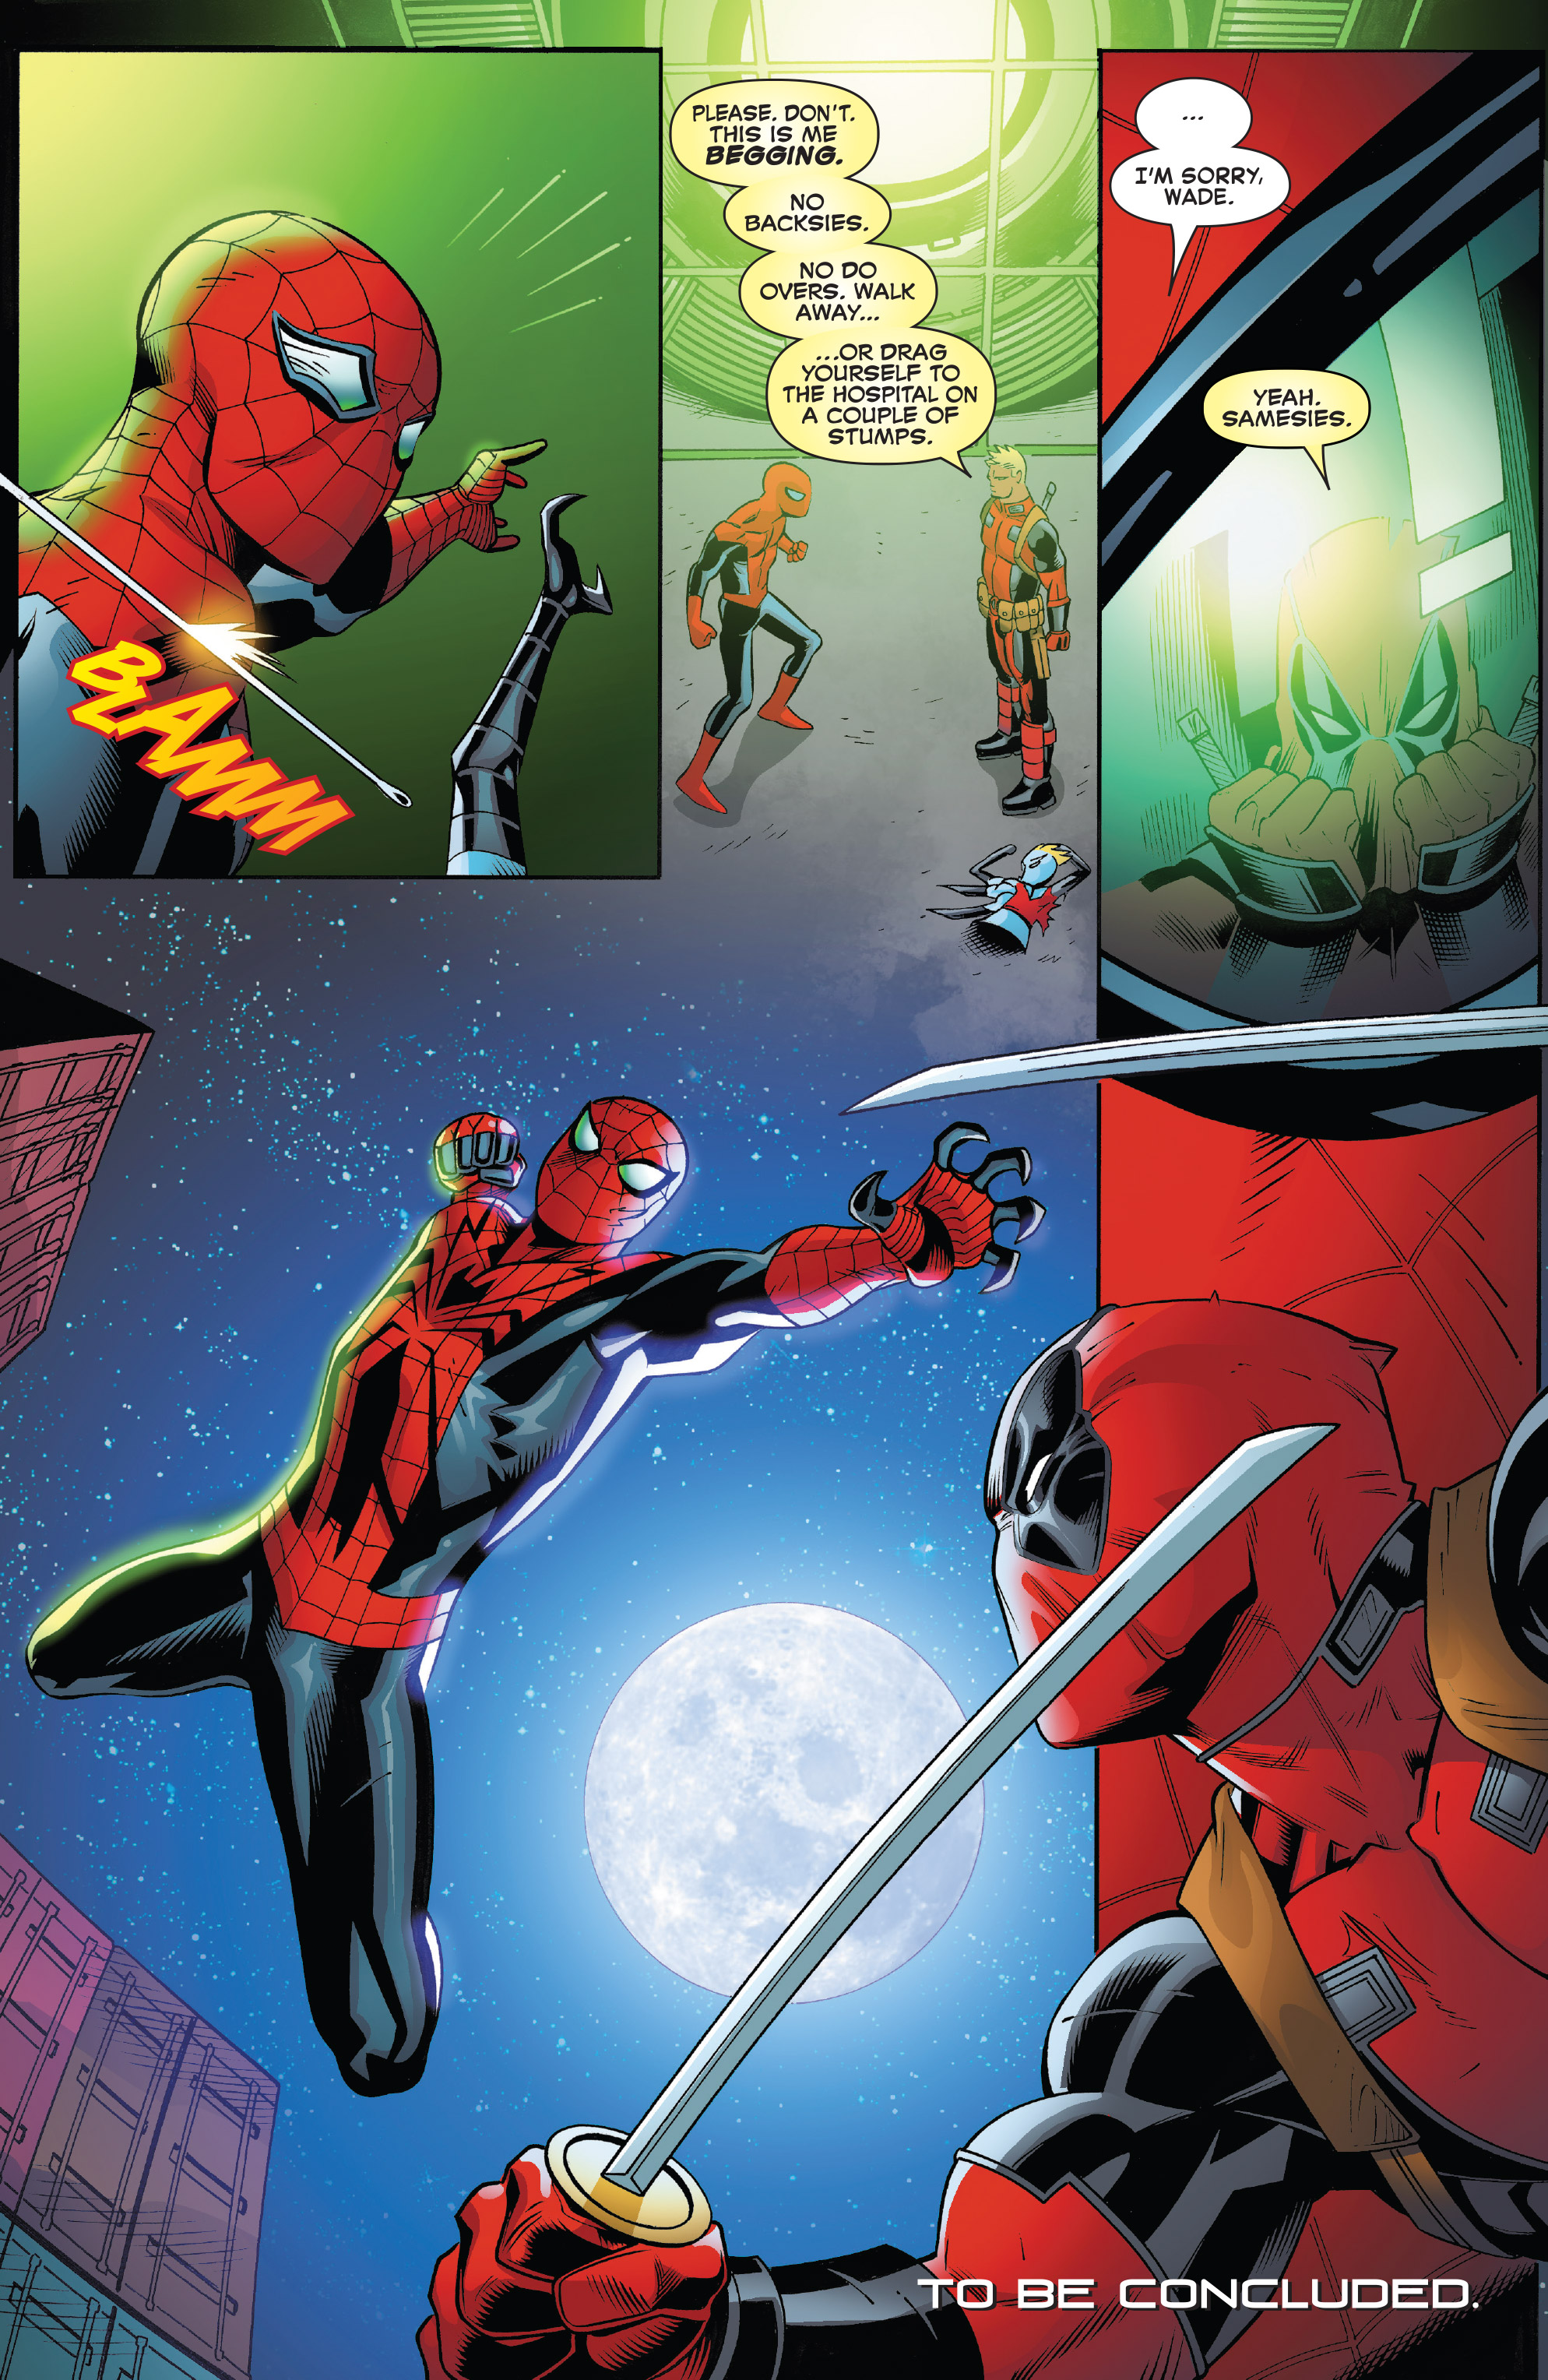 Read online Spider-Man/Deadpool comic -  Issue #17 - 19